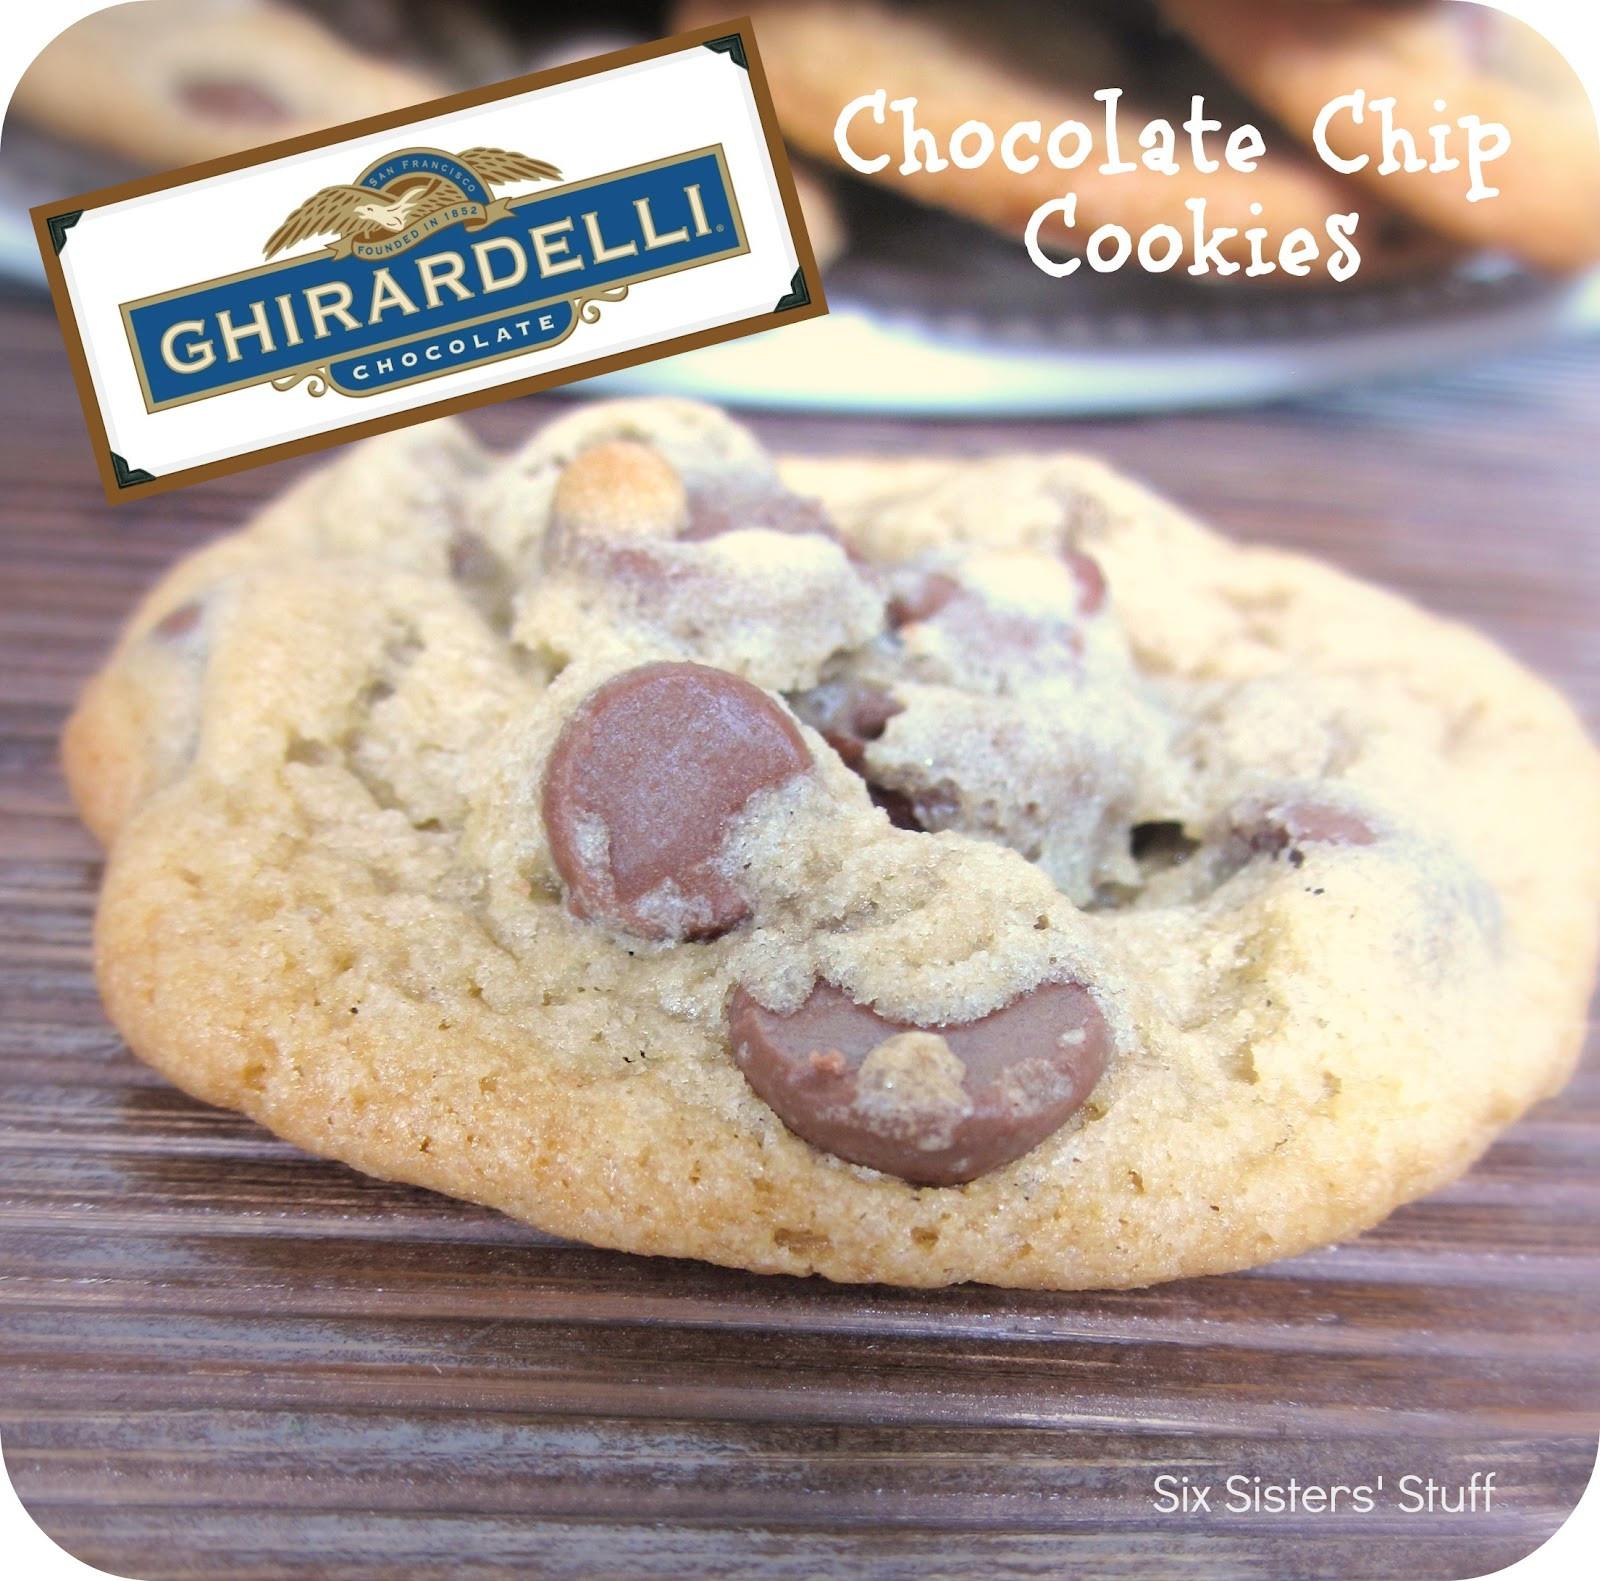 Ghirardelli Chocolate Chip Cookies  Ghirardelli Chocolate Chip Cookies Recipe